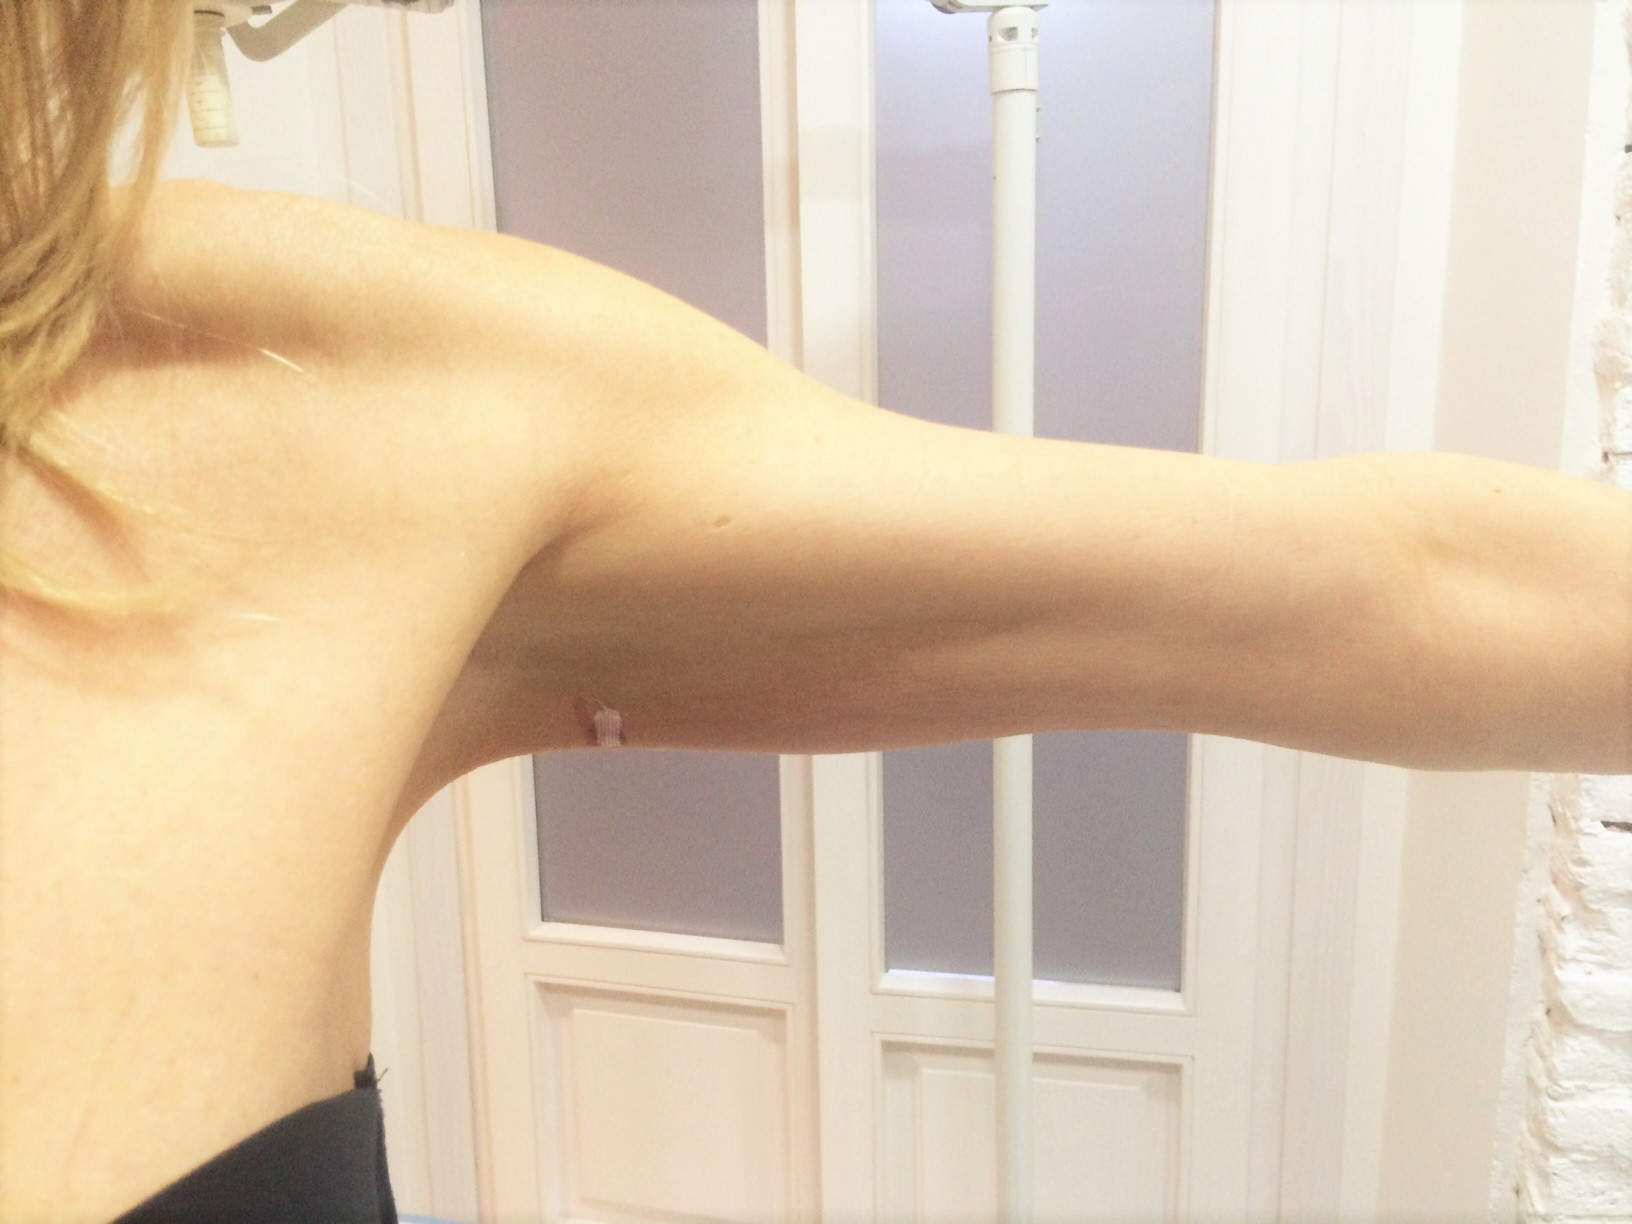 hilos-tensores-corporales-brazo